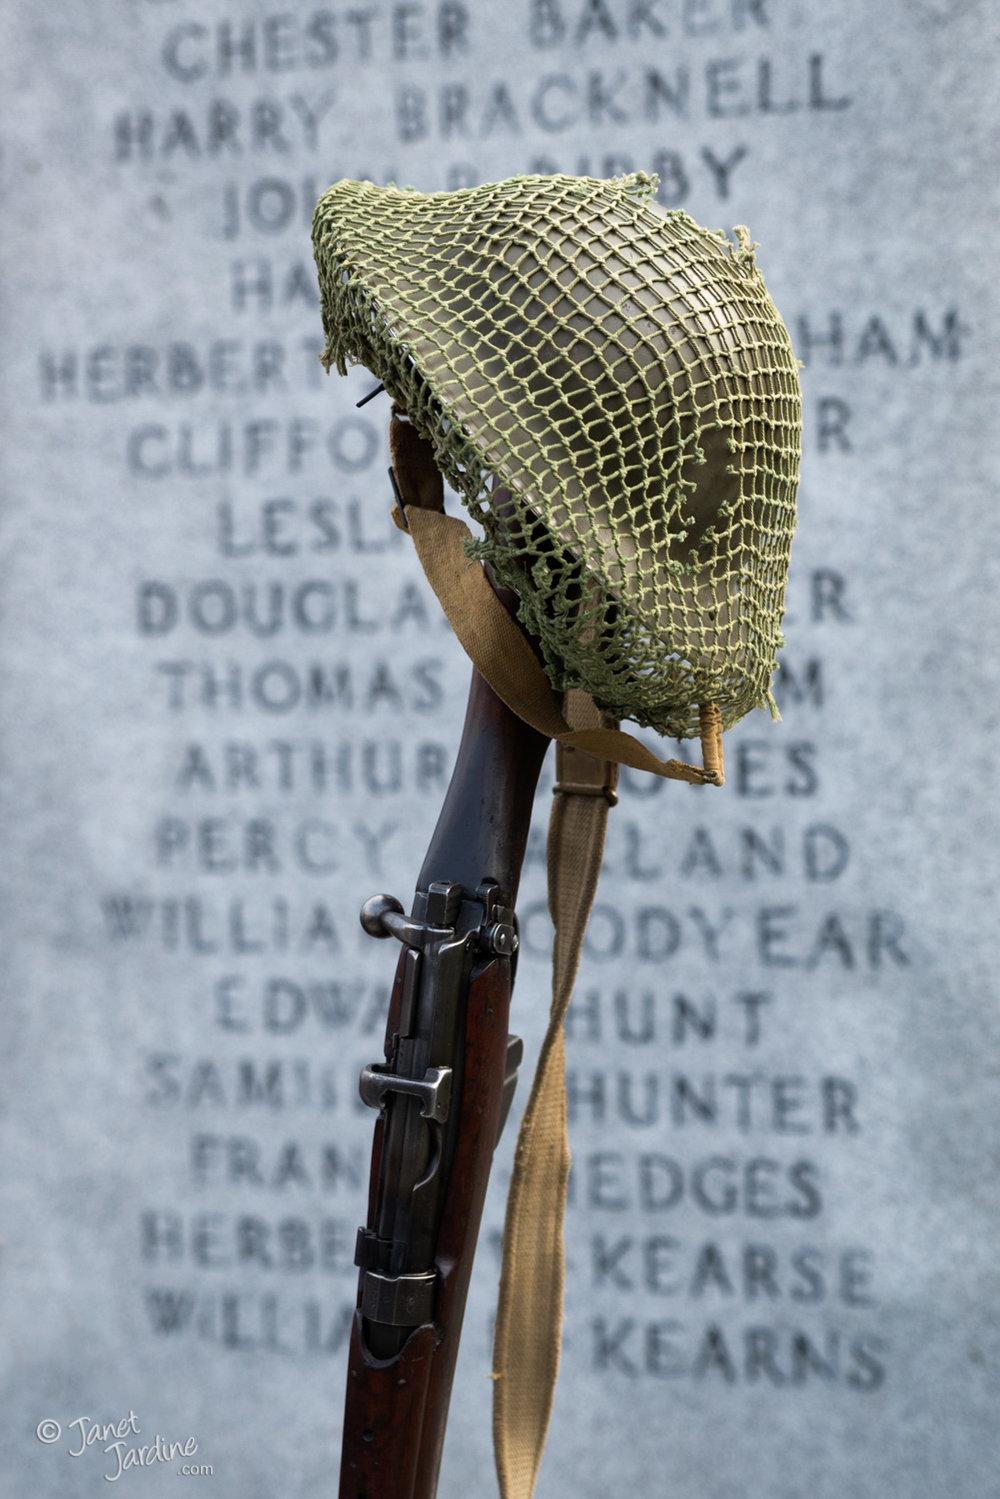 Fallen-soldier-symbolism_Photo_copyright_Janet_Jardine_SquareSpace.jpg